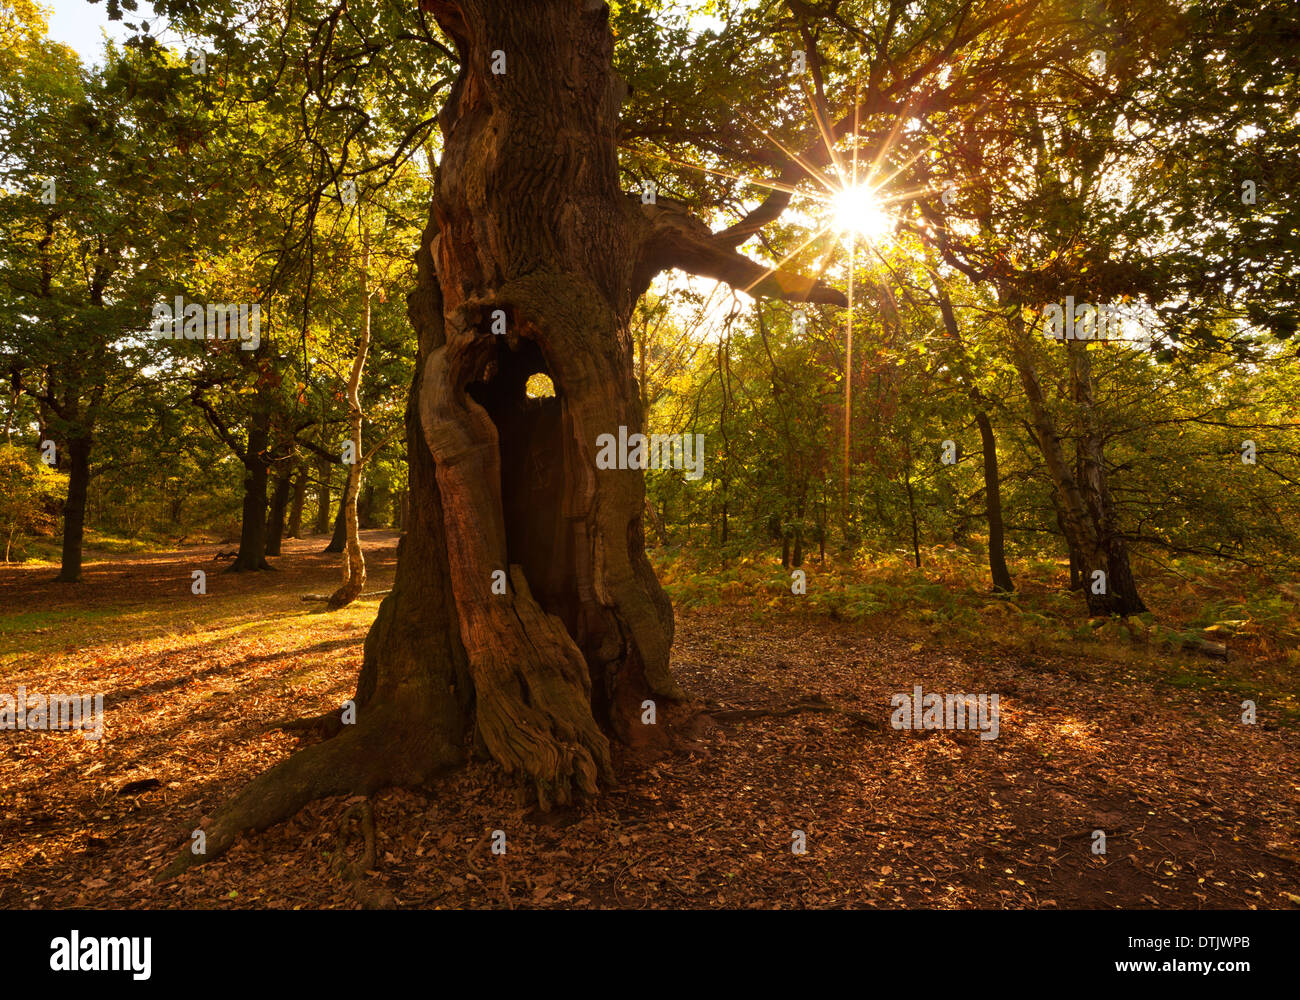 La Foresta di Sherwood alberi Edwinstowe nottinghamshire England Regno Unito GB EU Europe Immagini Stock